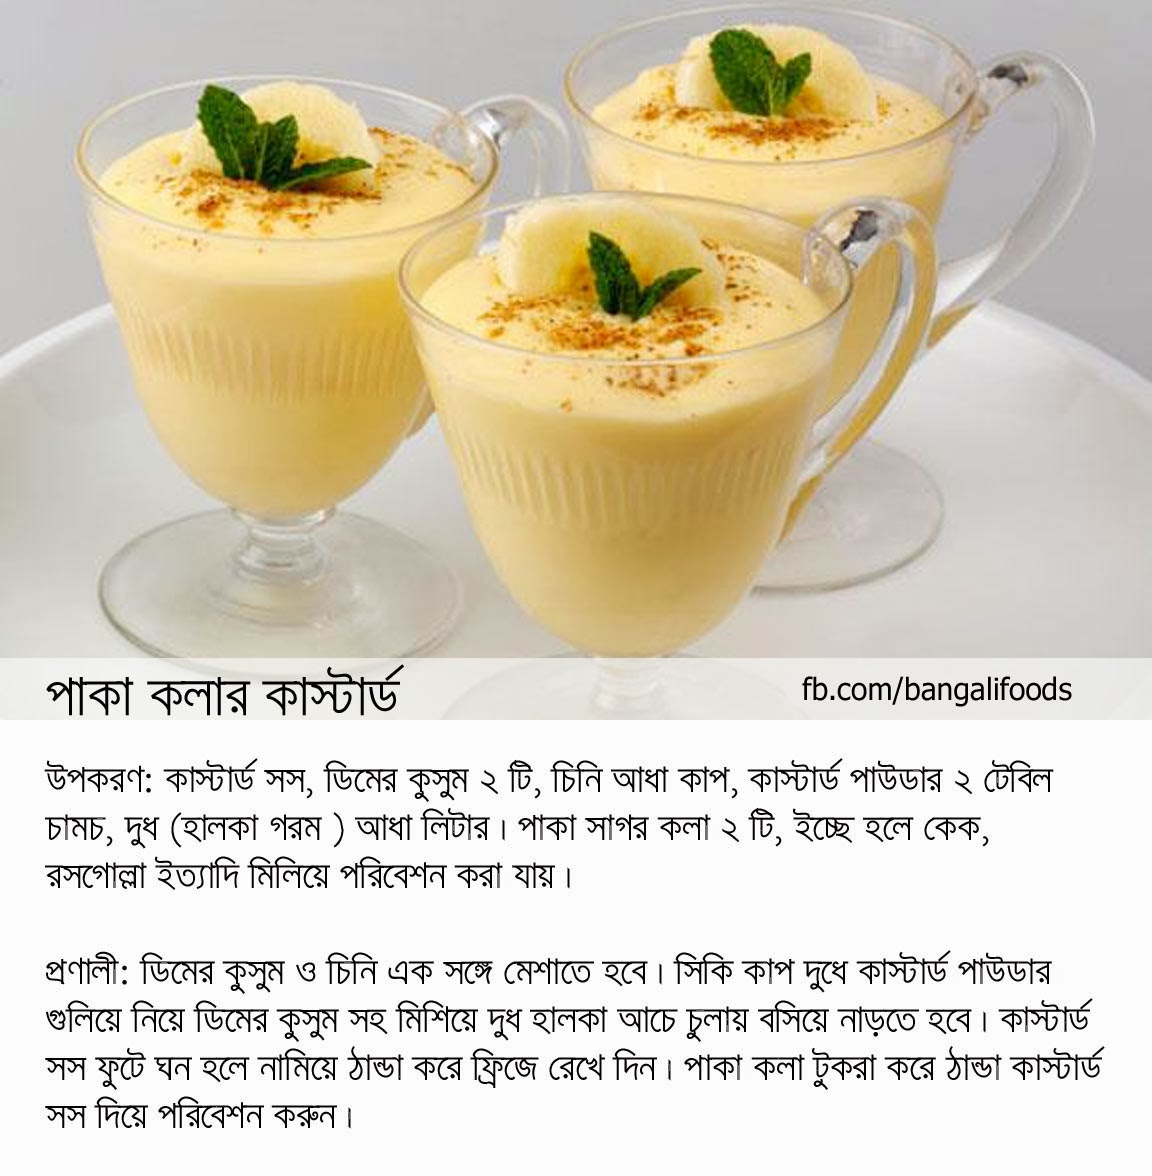 Bangali foods custard banana custard forumfinder Images